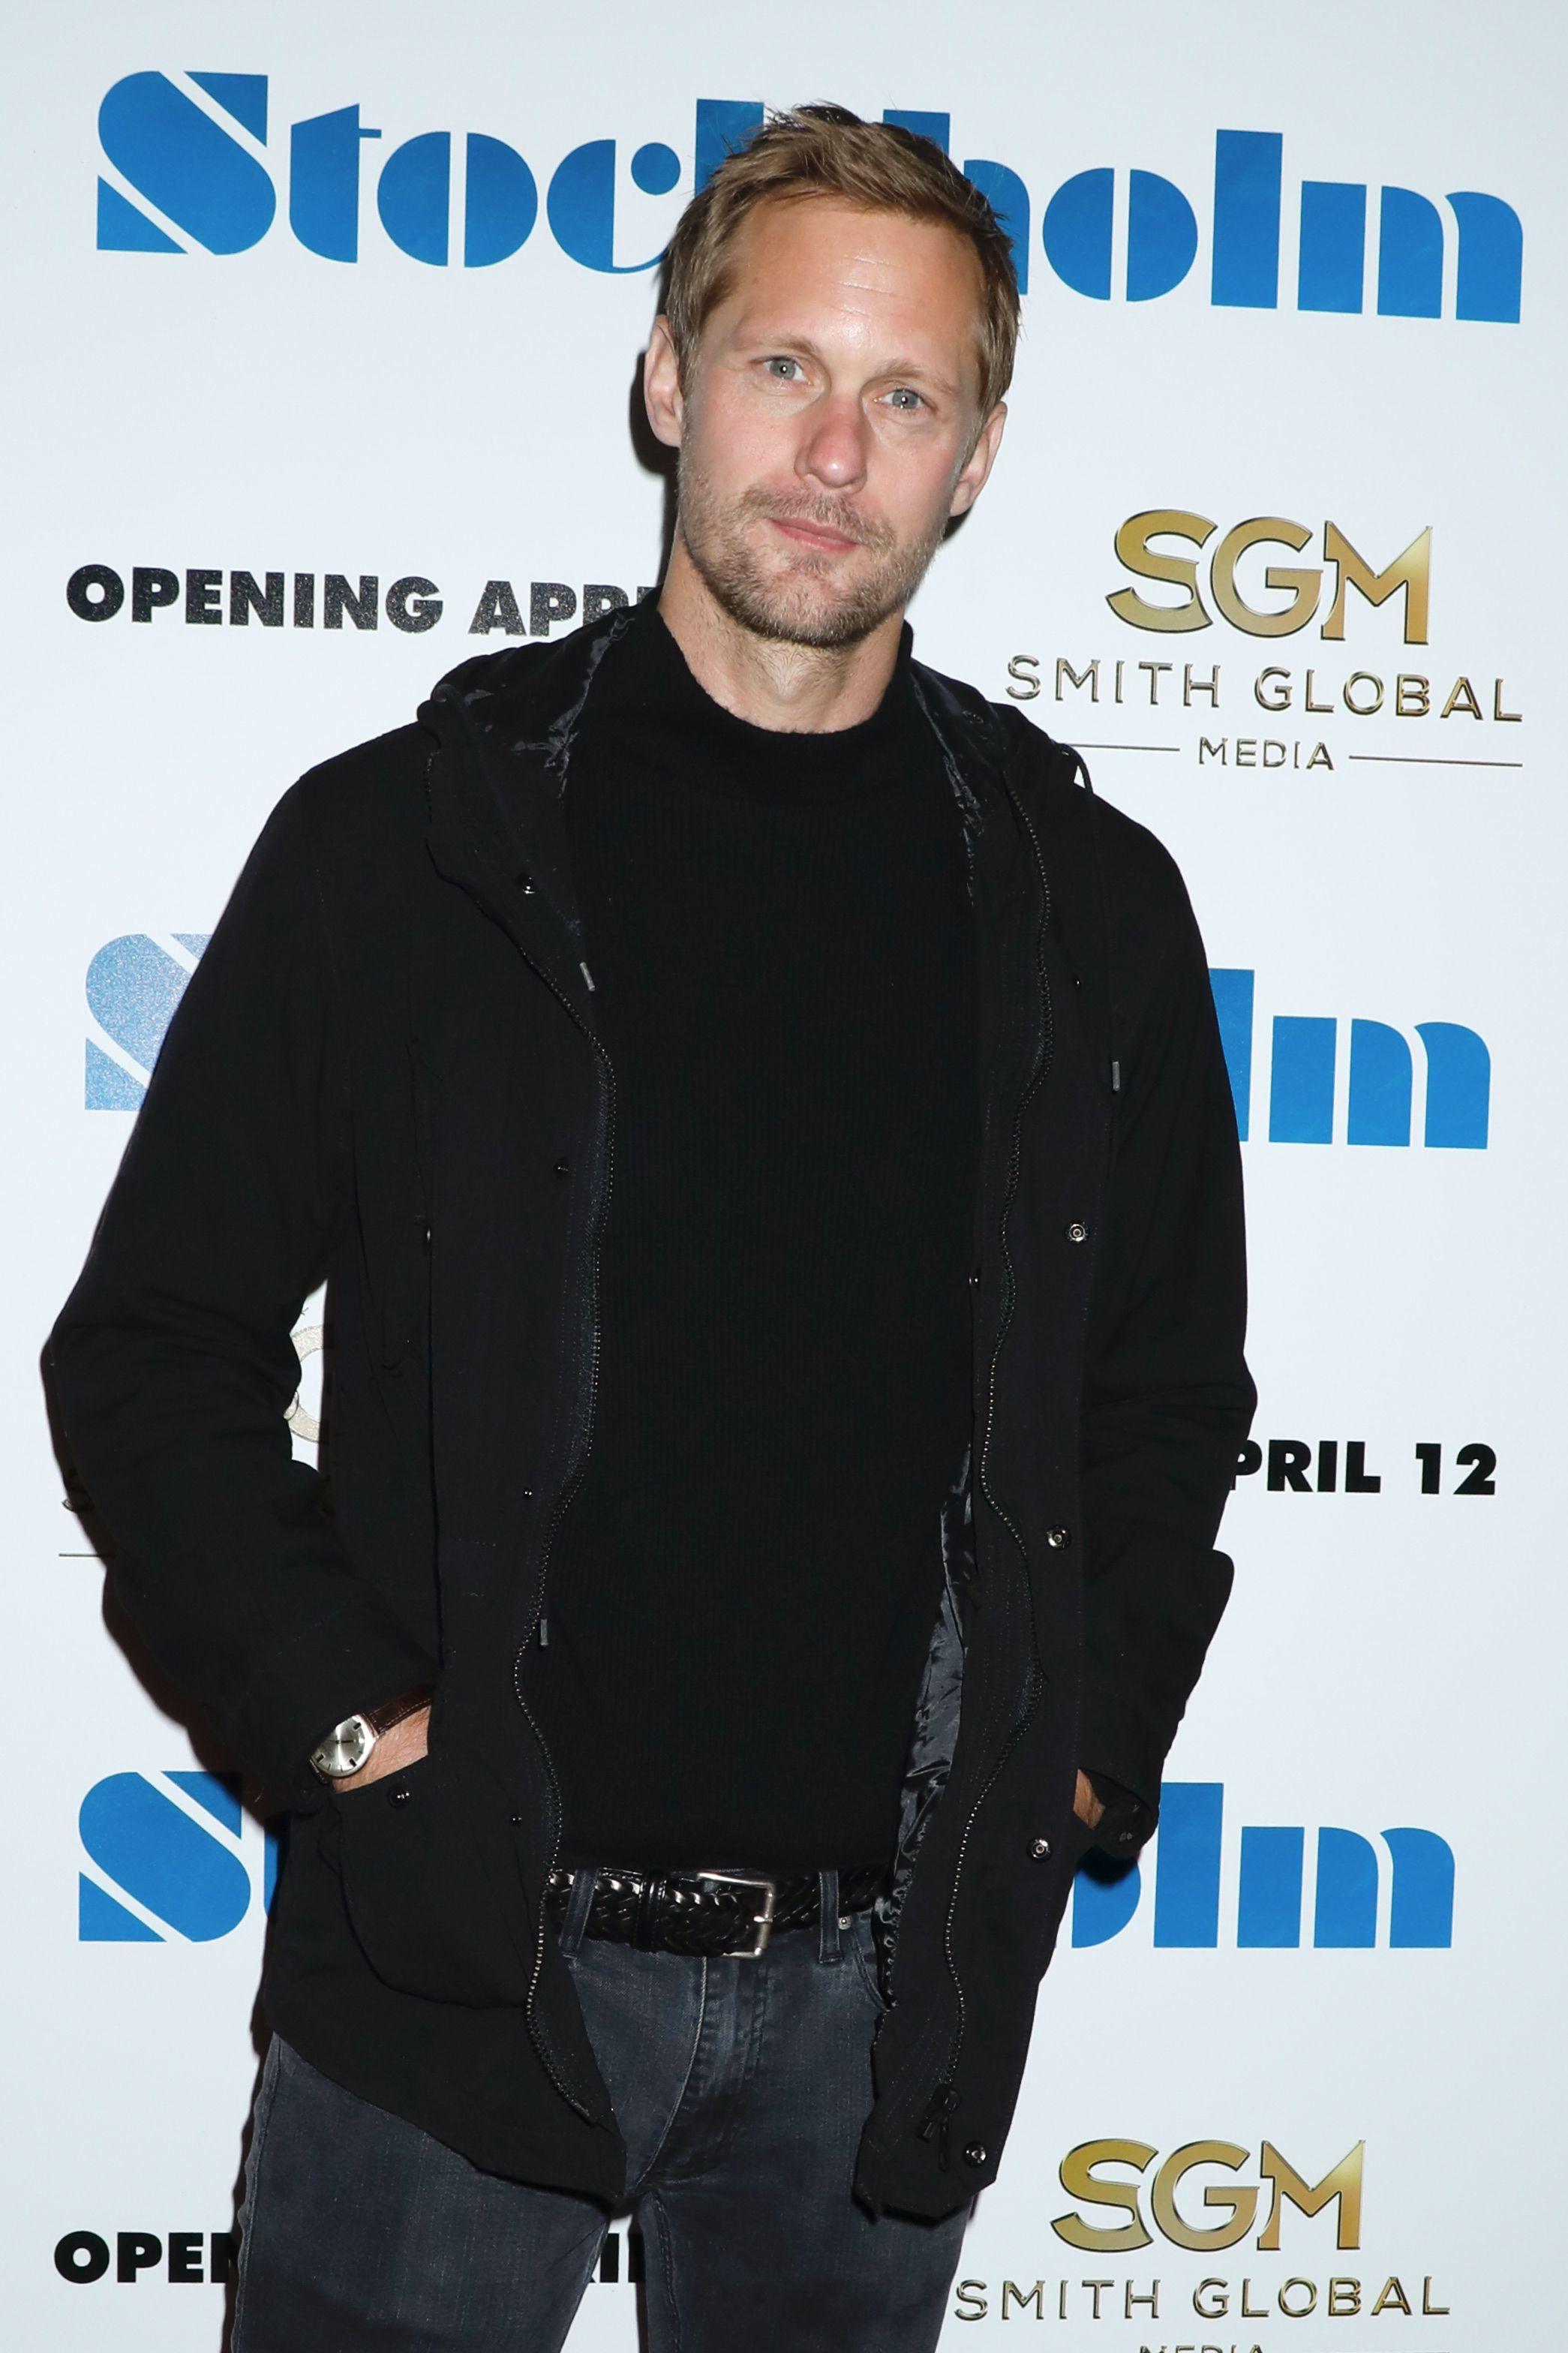 "Alexander Skarsgard attends the ""Stockholm"" film premiere in New York City on April 11, 2019."